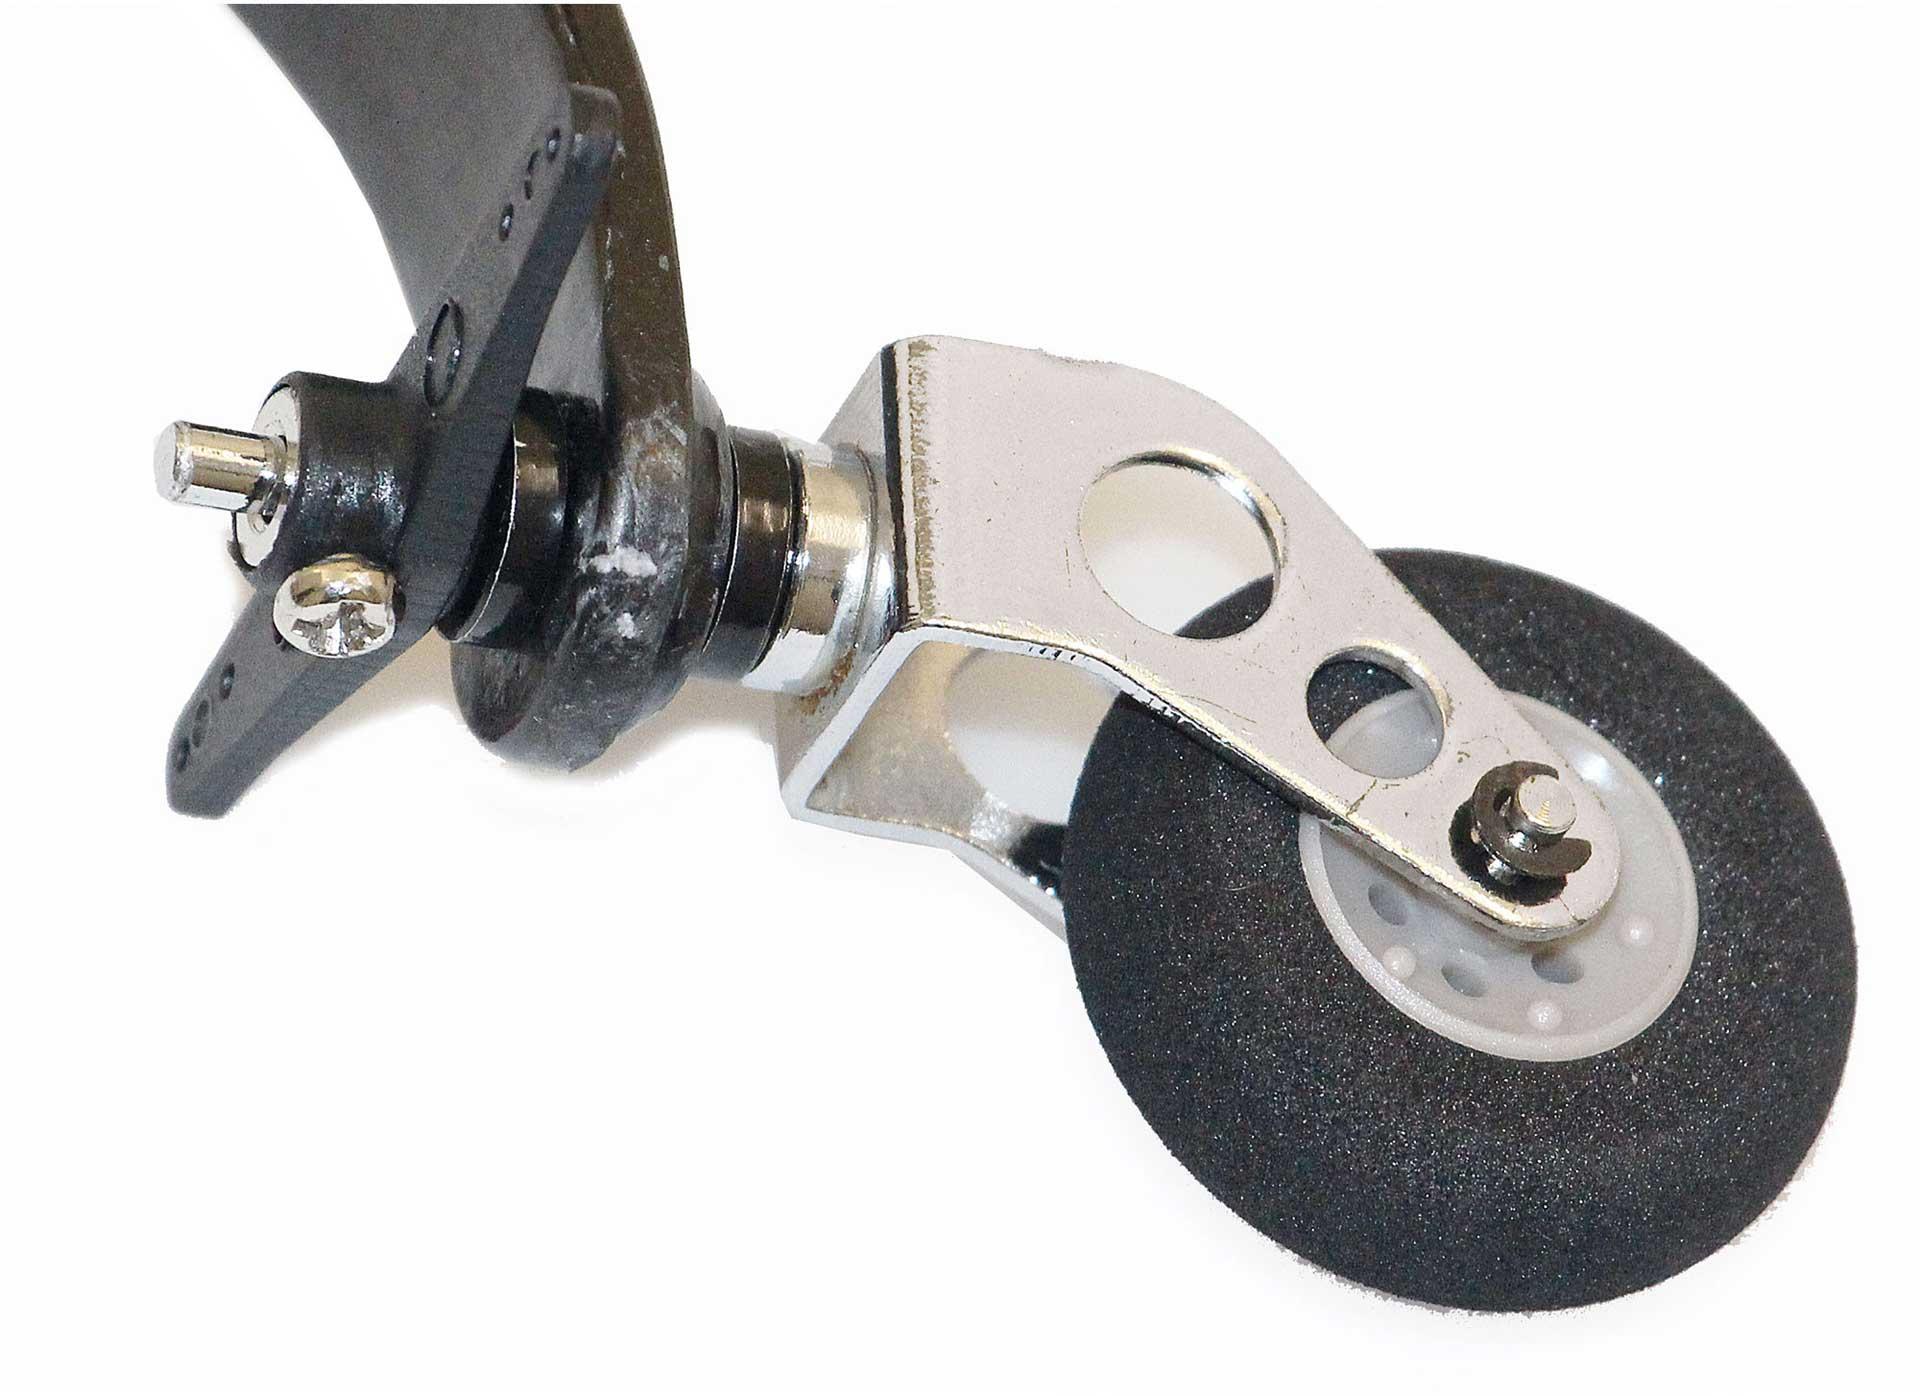 Robbe Heckfahrwerk Carbon mittel lenkbar mit Rad 30mm